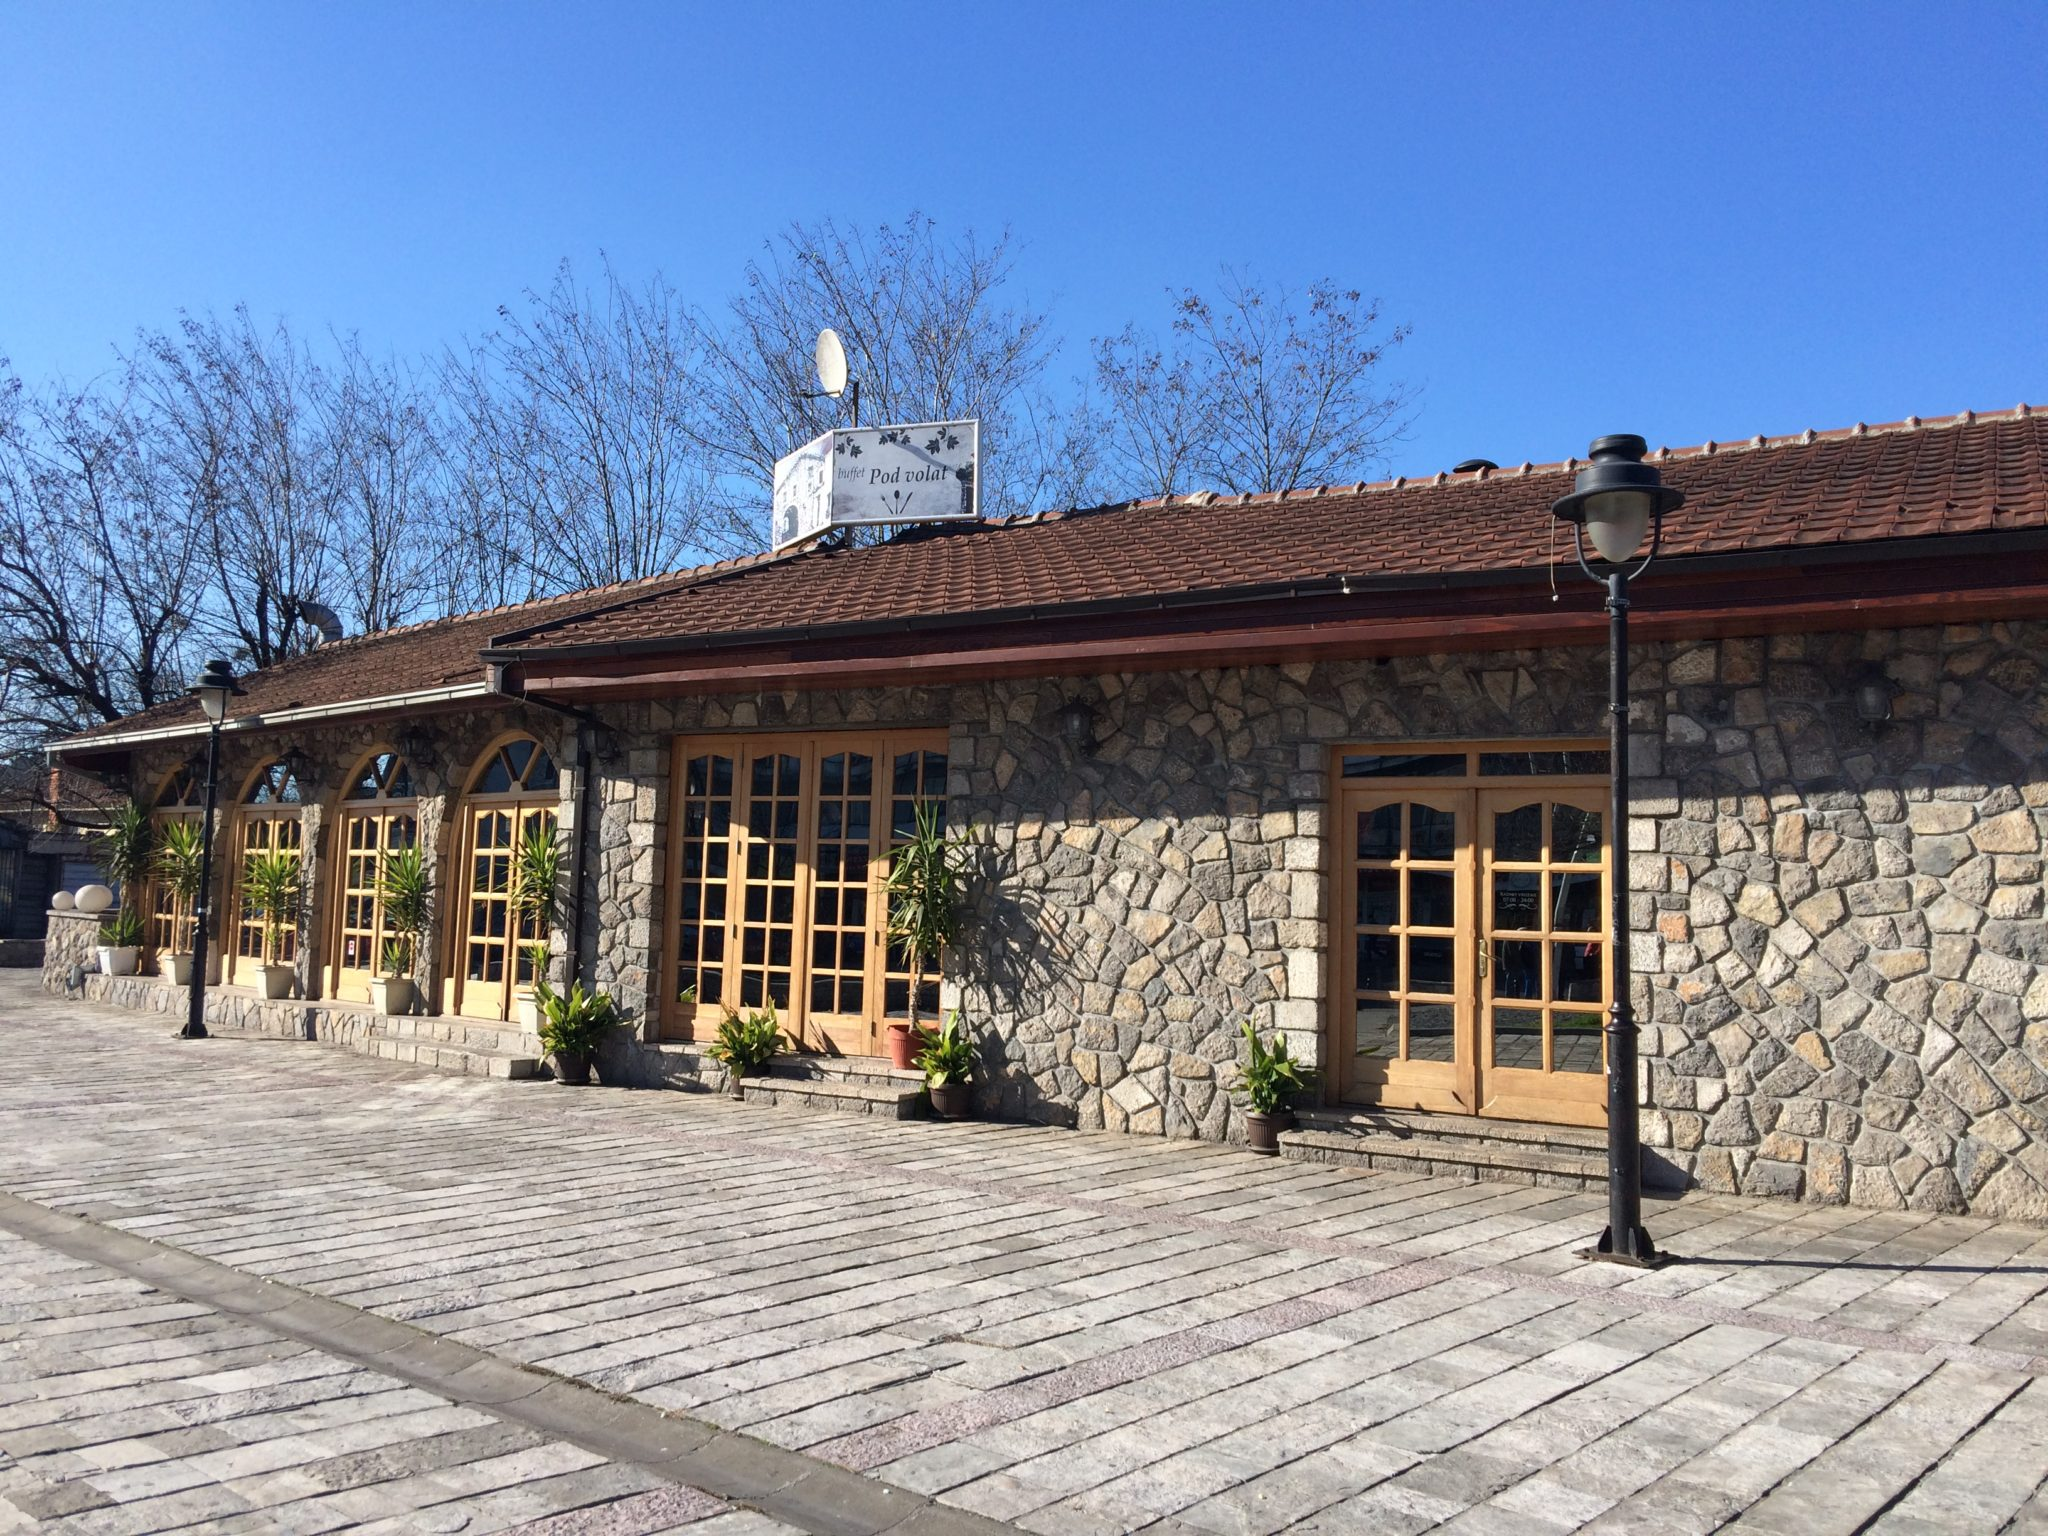 Visiting Montenegro in Winter - Pod Volat, Podgorica